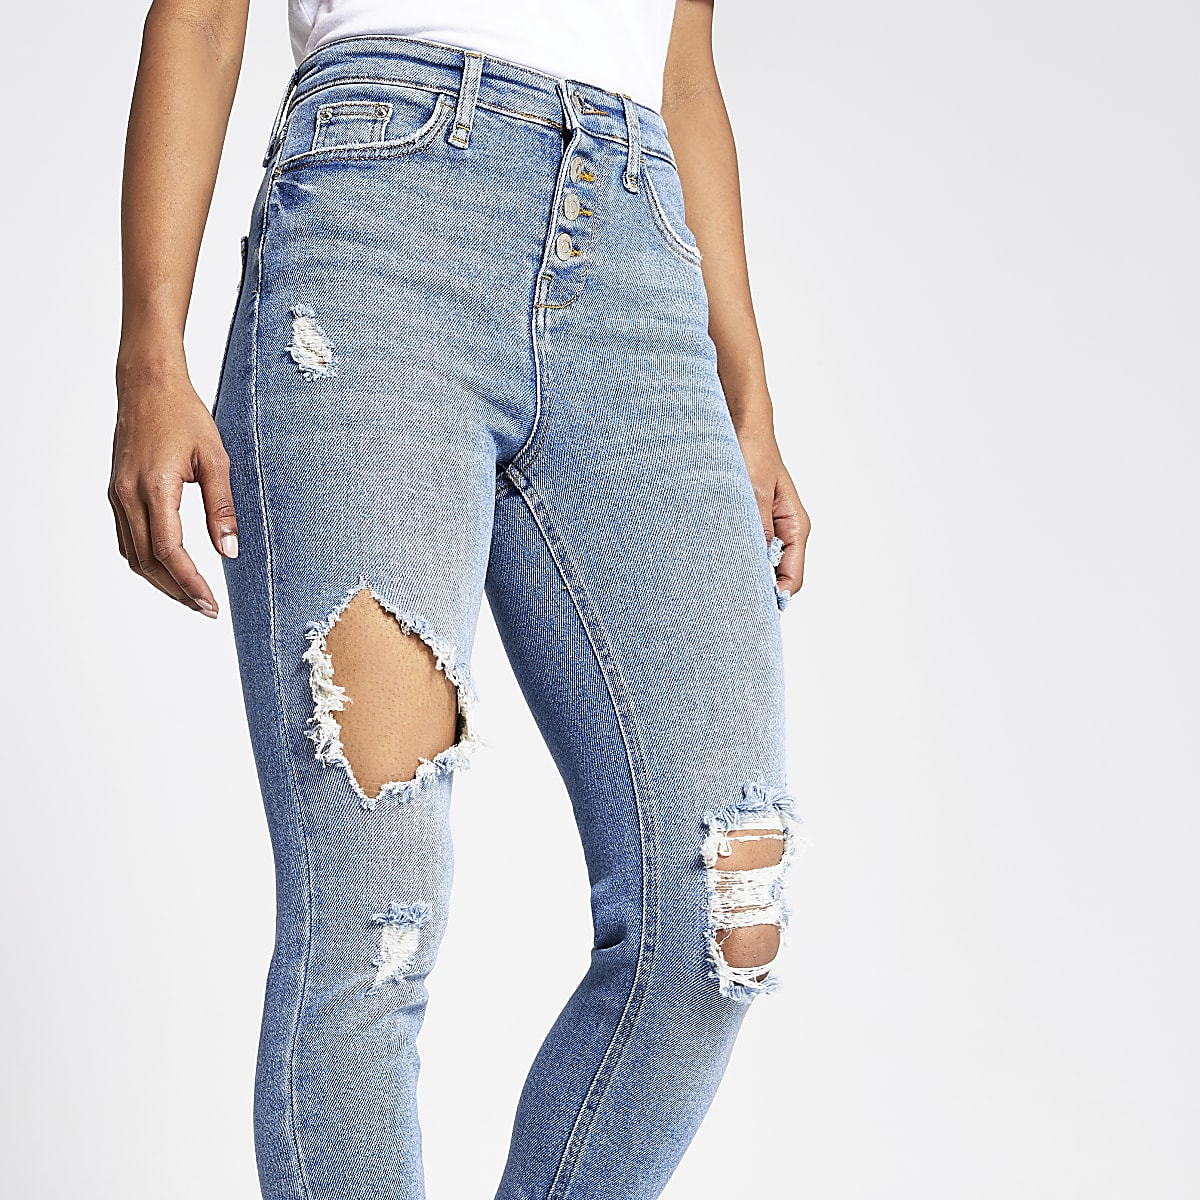 RI Petite - Hailey - Middenblauwe ripped jeans met hoge taille